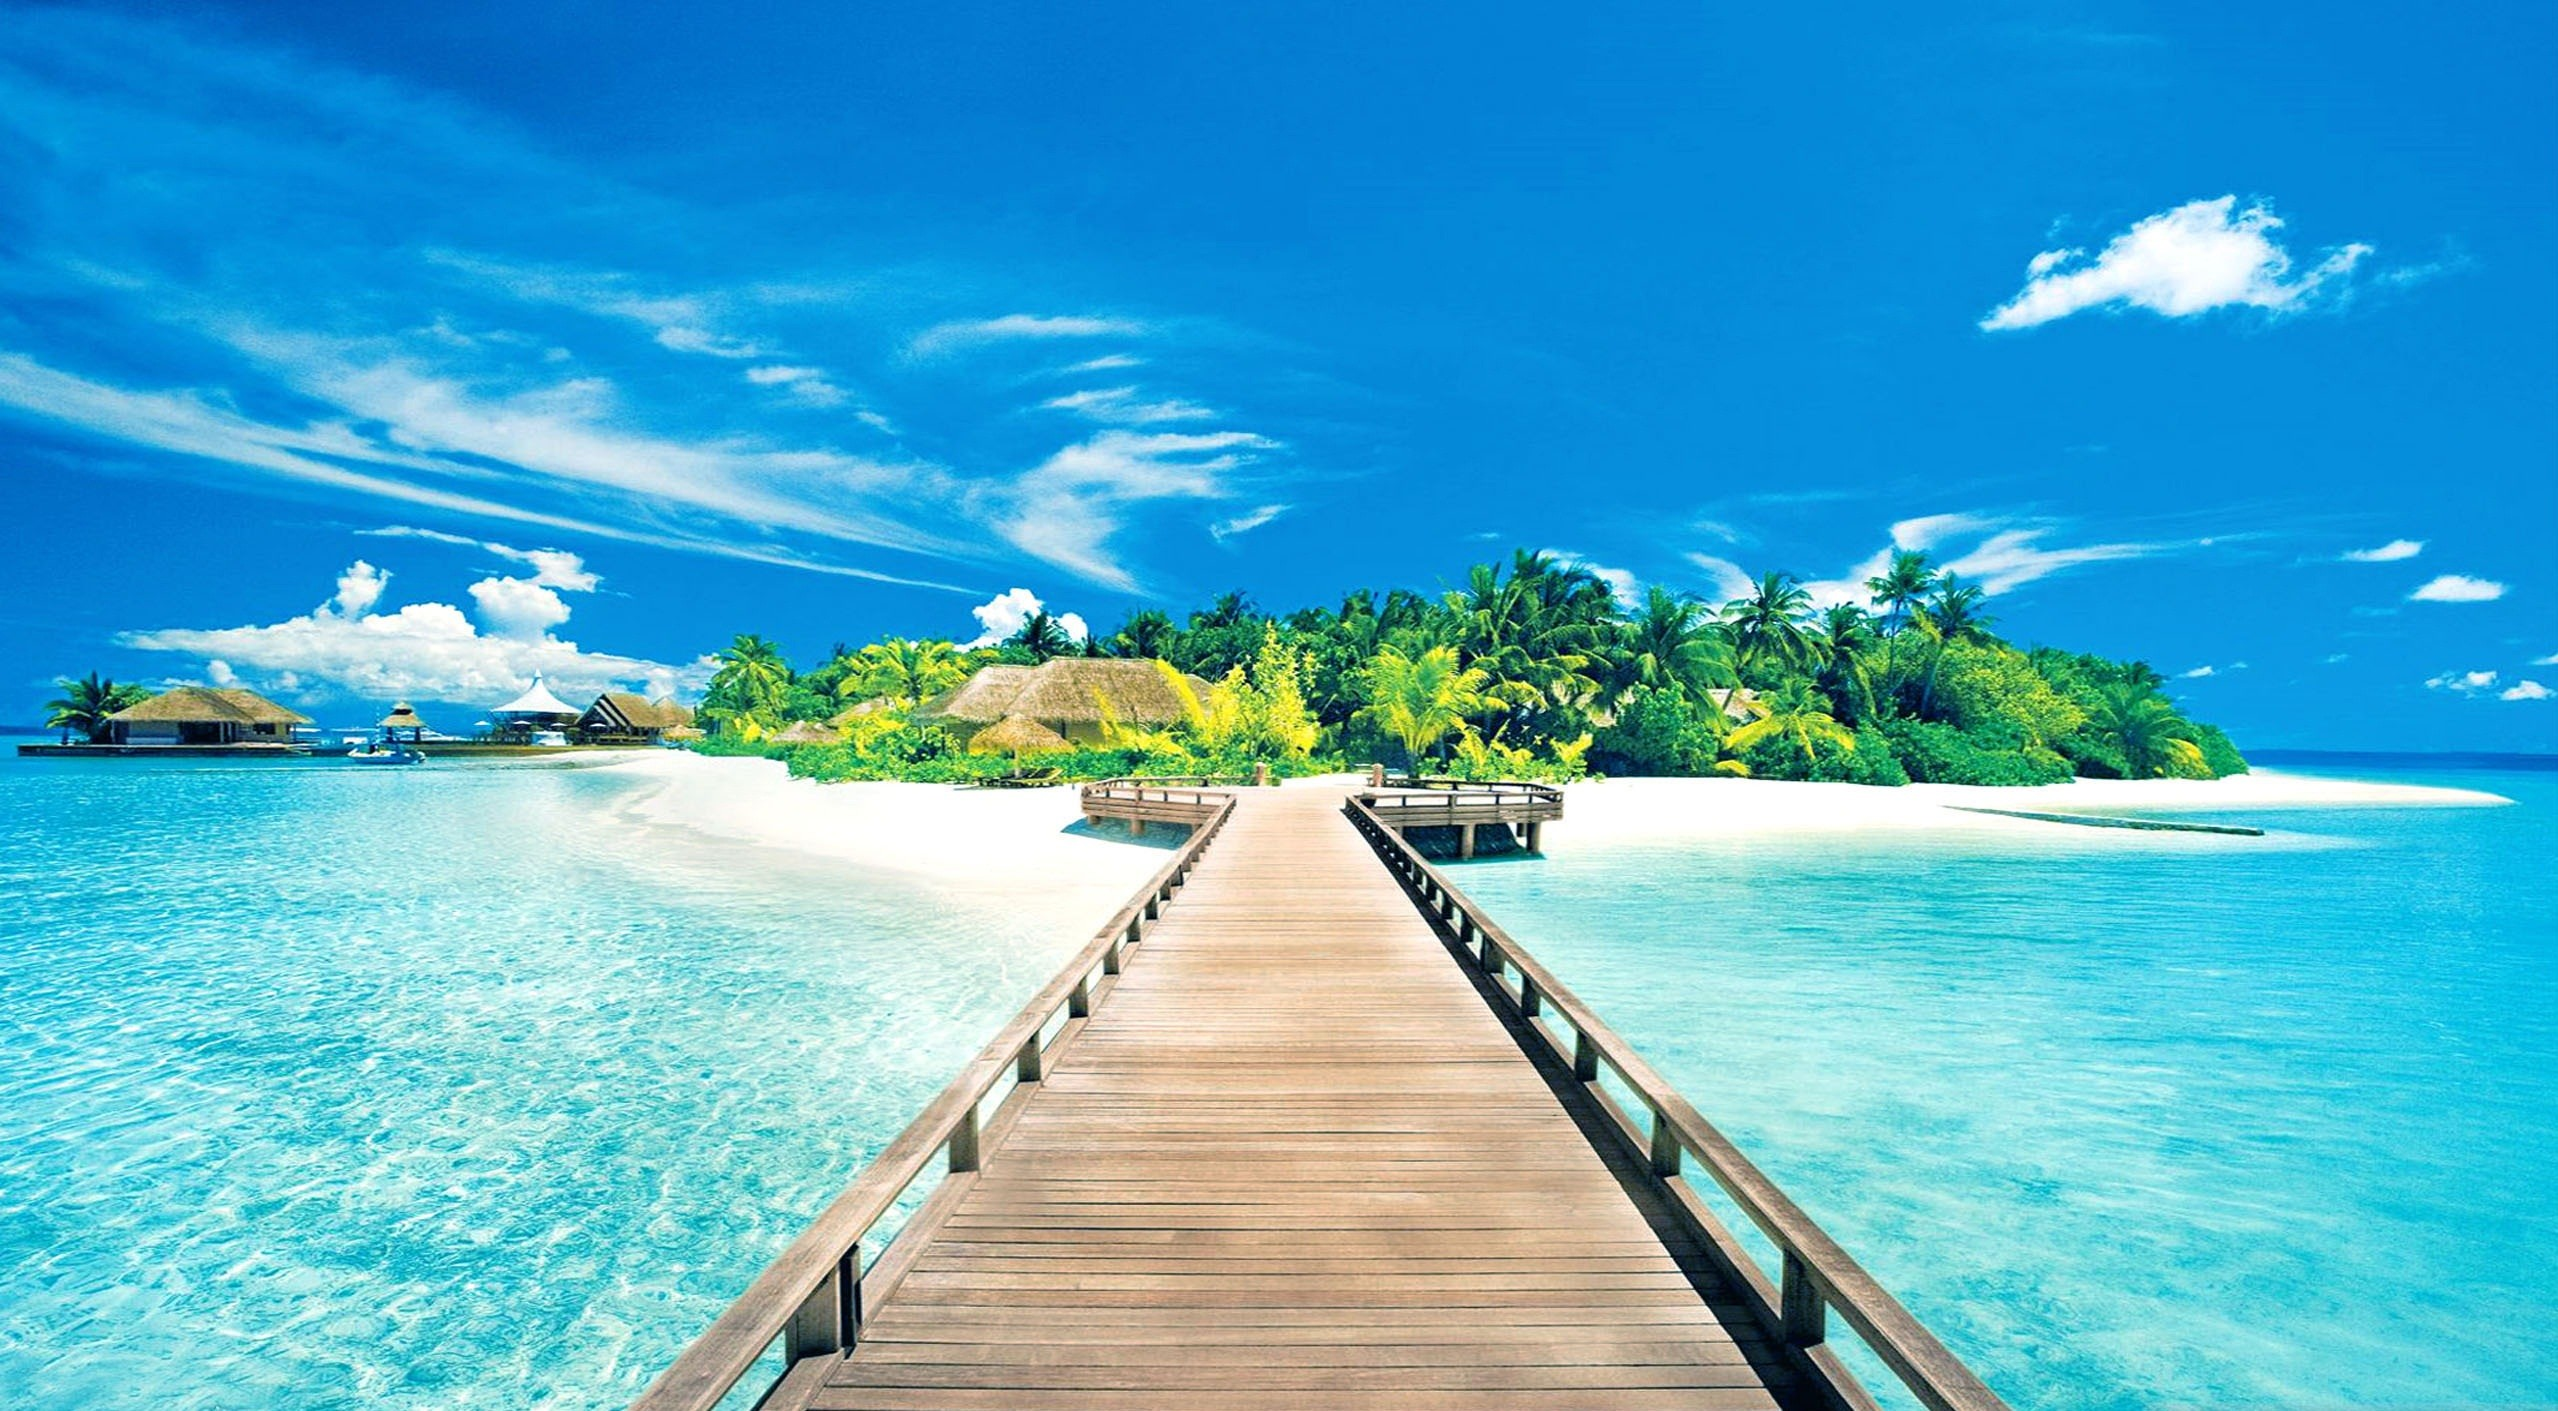 Res: 2558x1411, Beach Summer Desktop Wallpaper Simple White Blue Motive Ideas Personalized  Sample Themes Creative